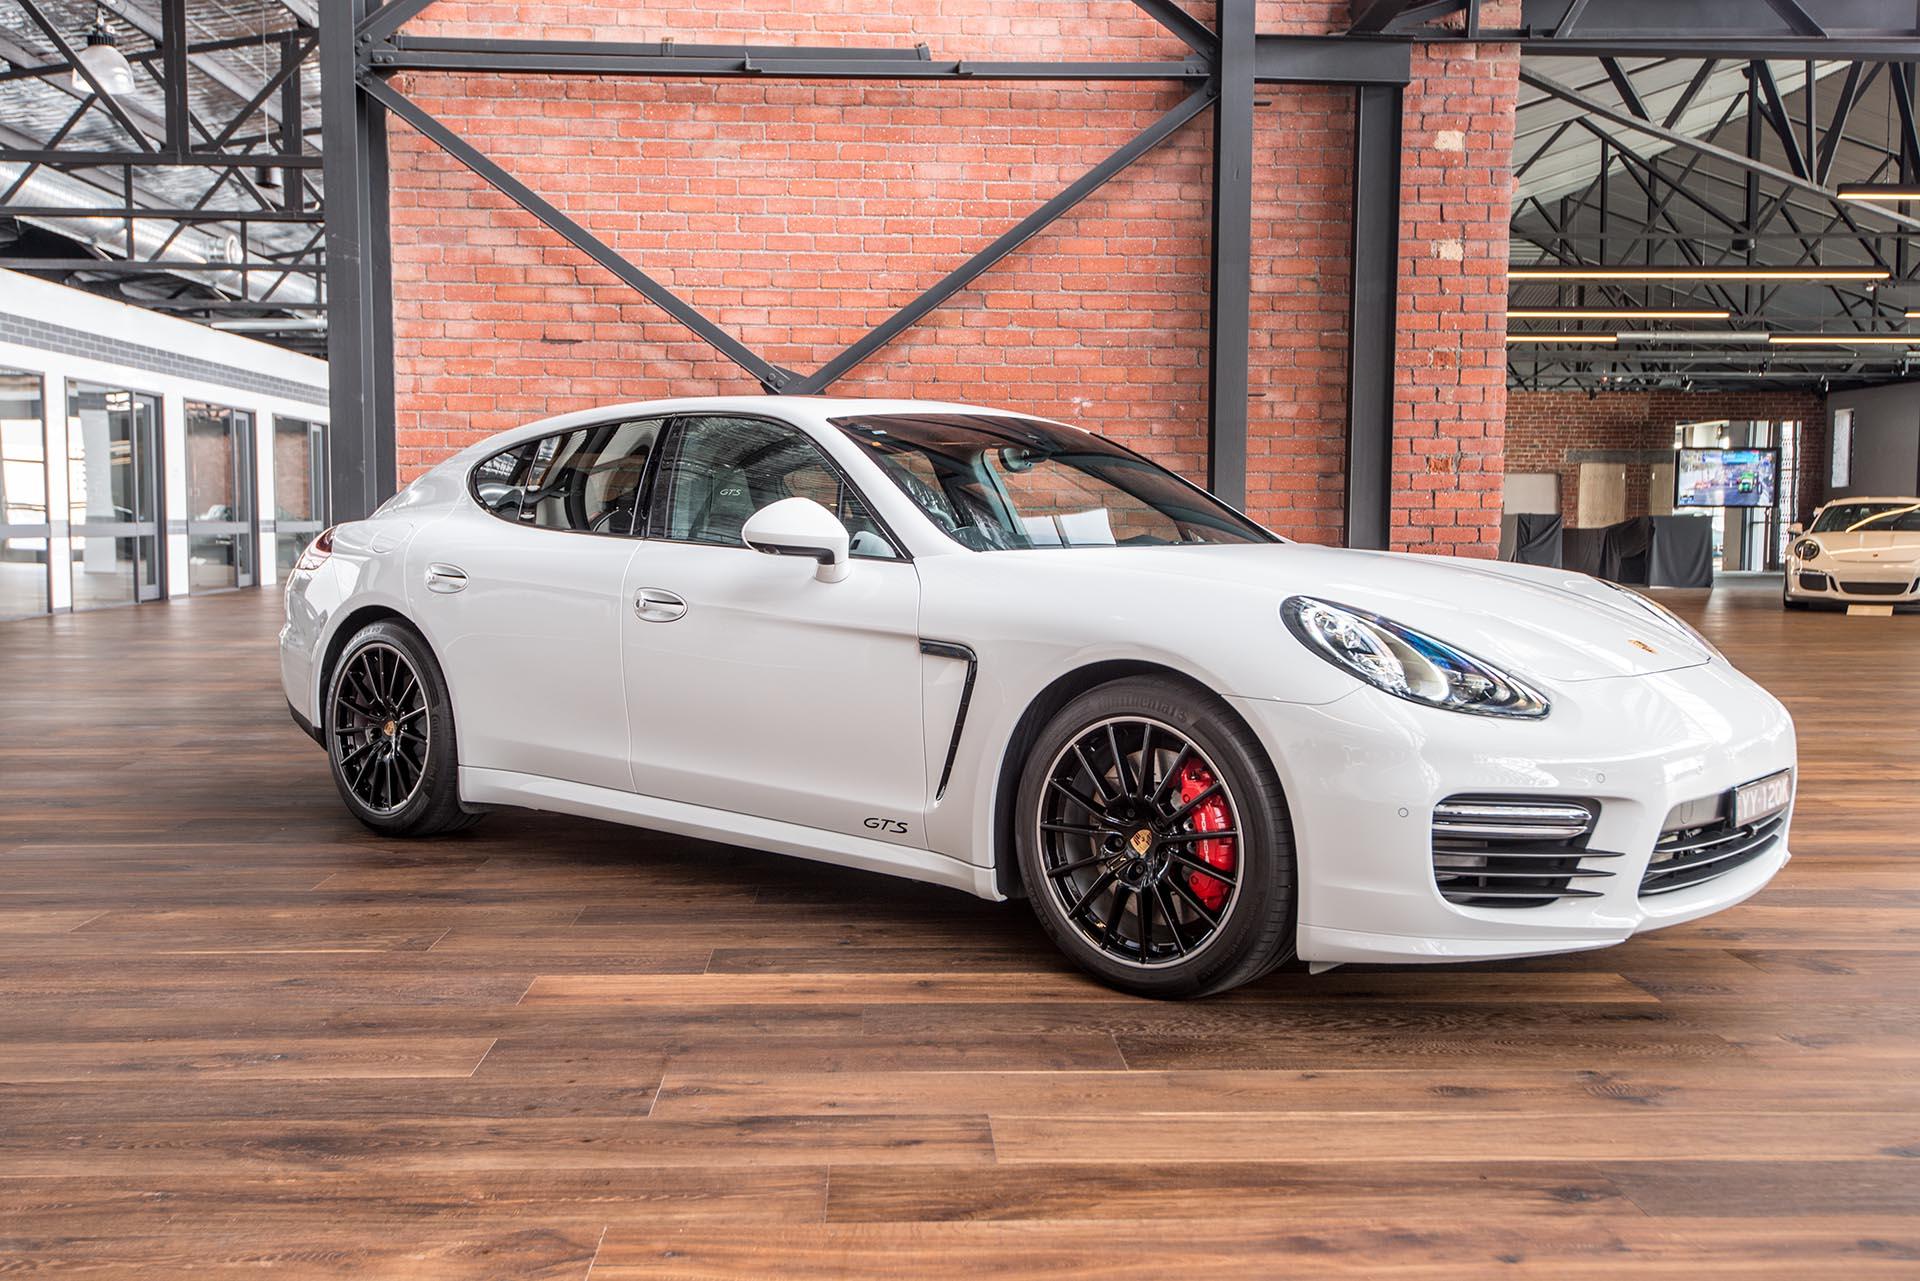 Porsche Panamera Gts White 13 Richmonds Classic And Prestige Cars Storage And Sales Adelaide Australia